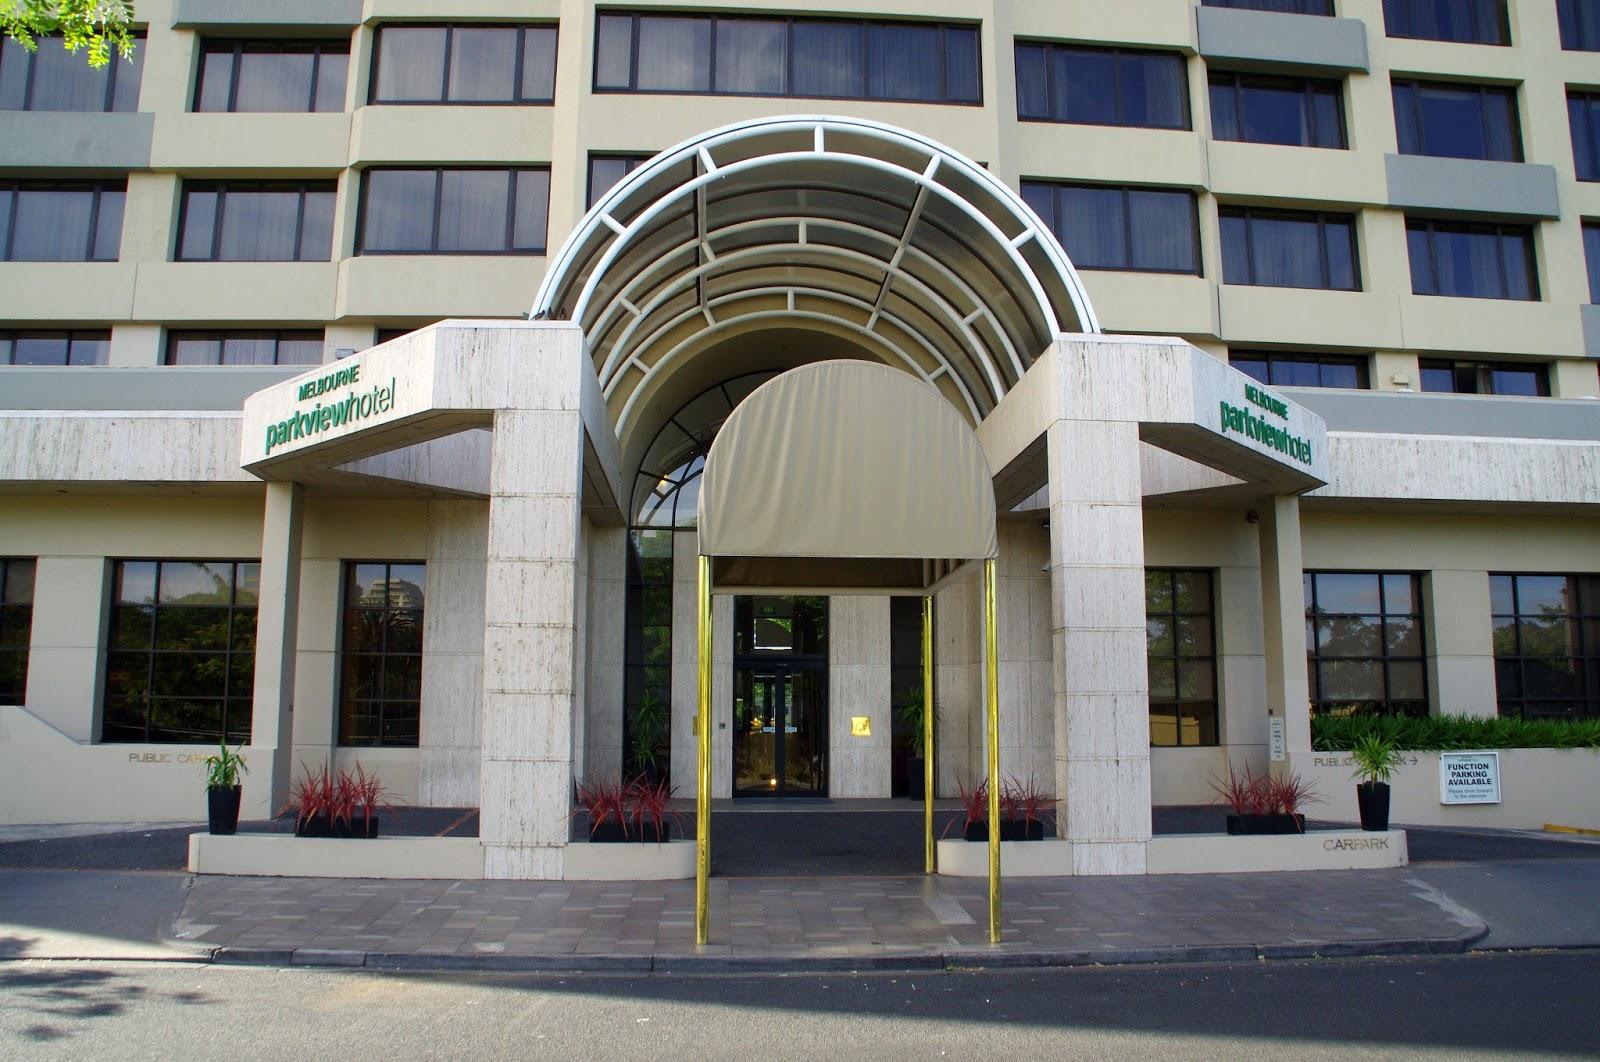 Melbourne Parkview Hotel Entrance